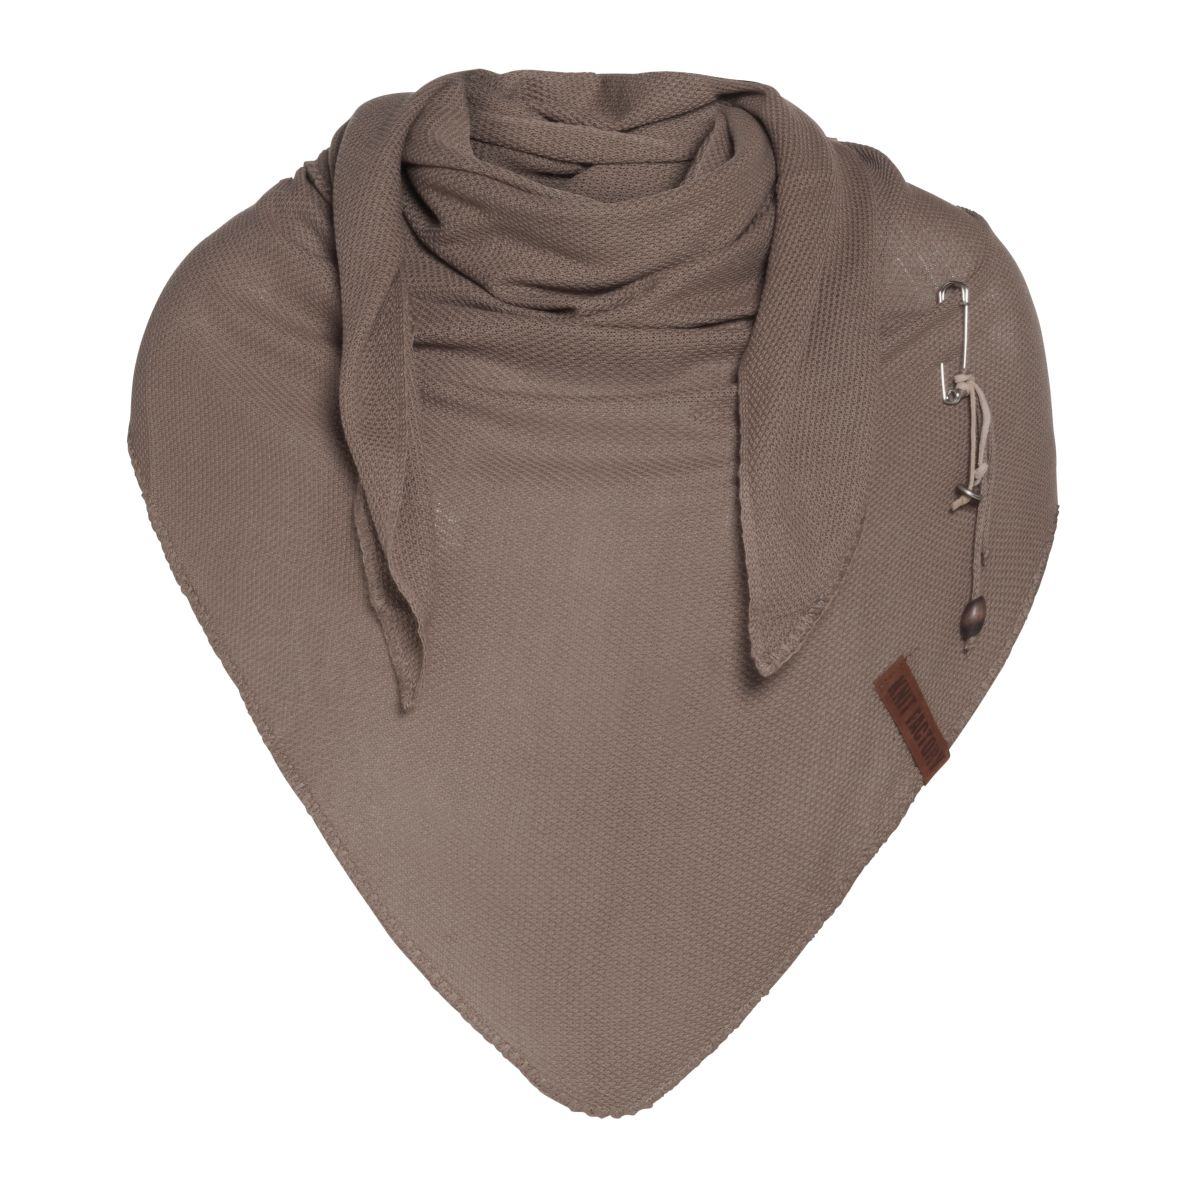 knit factory 1306020 lola omslagdoek new camel1